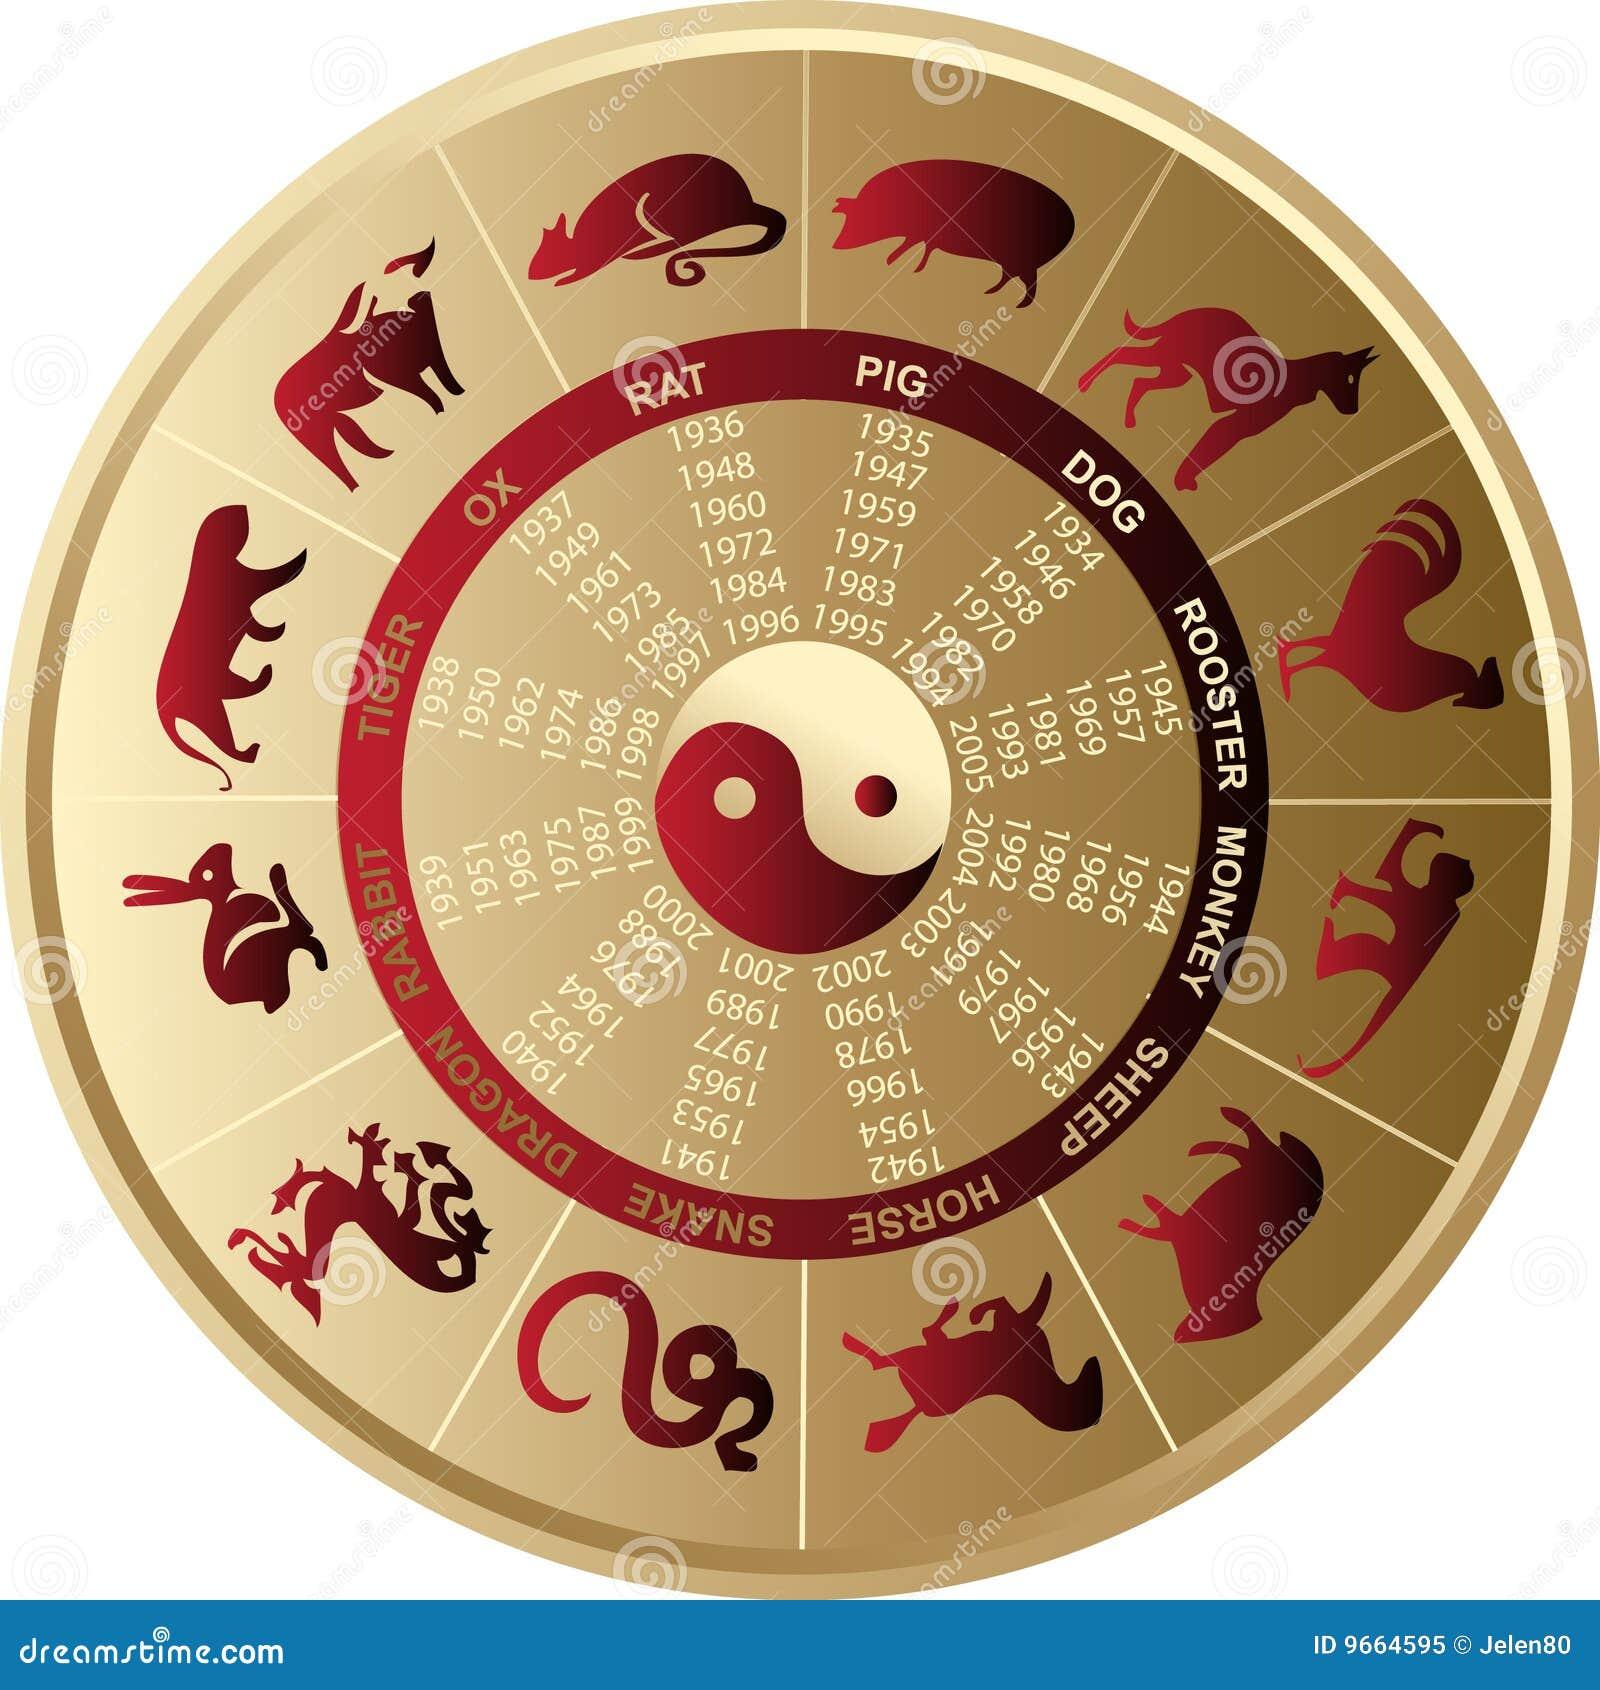 chinesisches horoskop lizenzfreies stockfoto bild 9664595. Black Bedroom Furniture Sets. Home Design Ideas